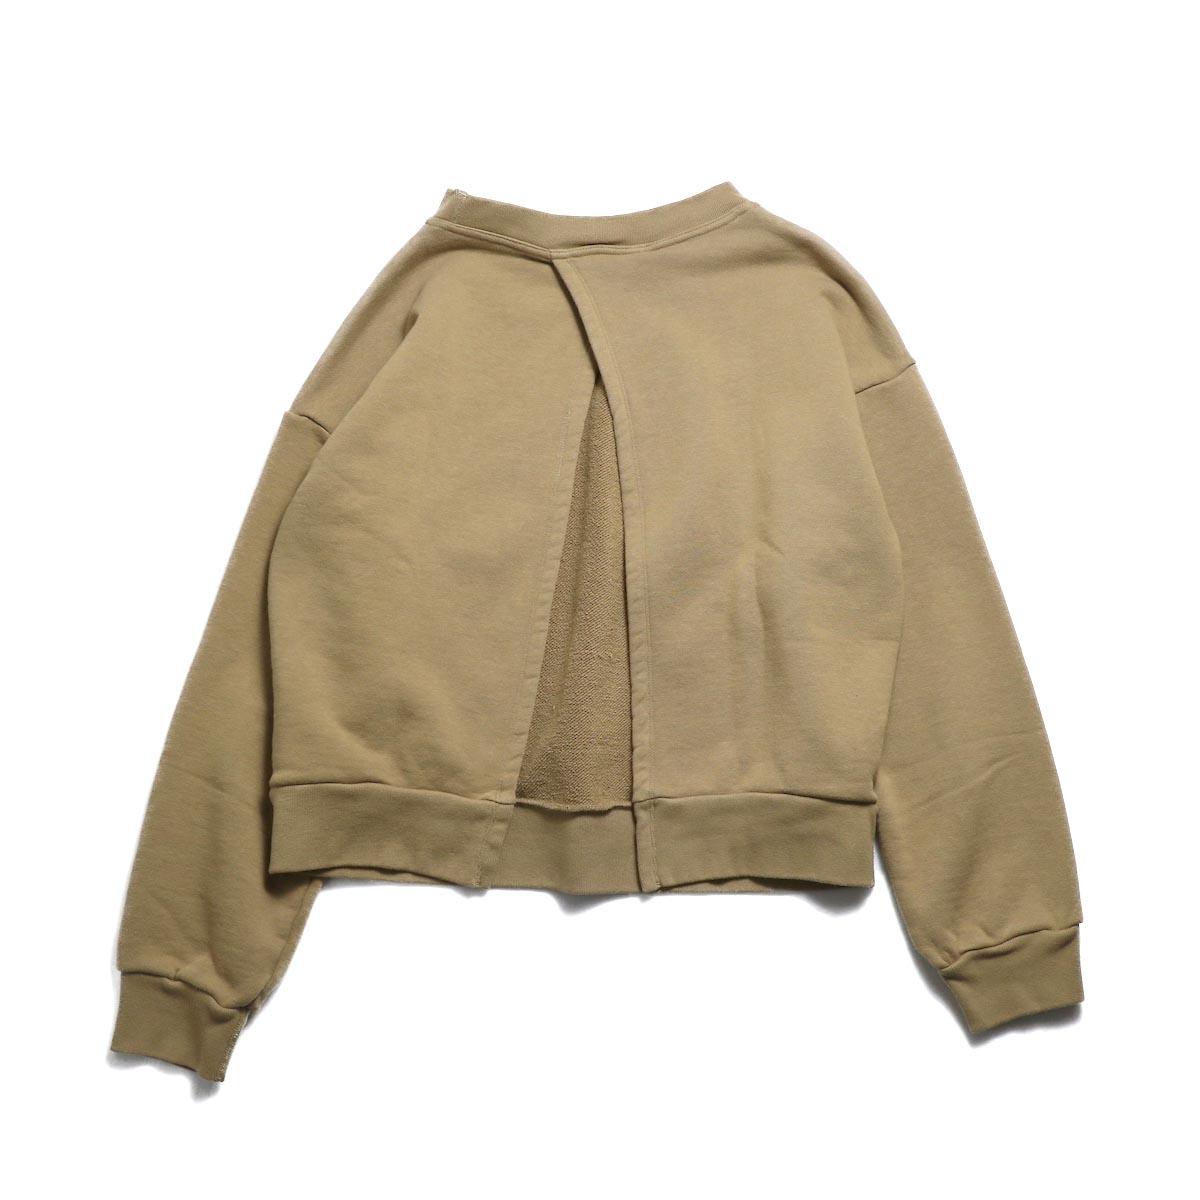 UNUSED / US1530 Crew Neck Sweat Shirt -CAMEL